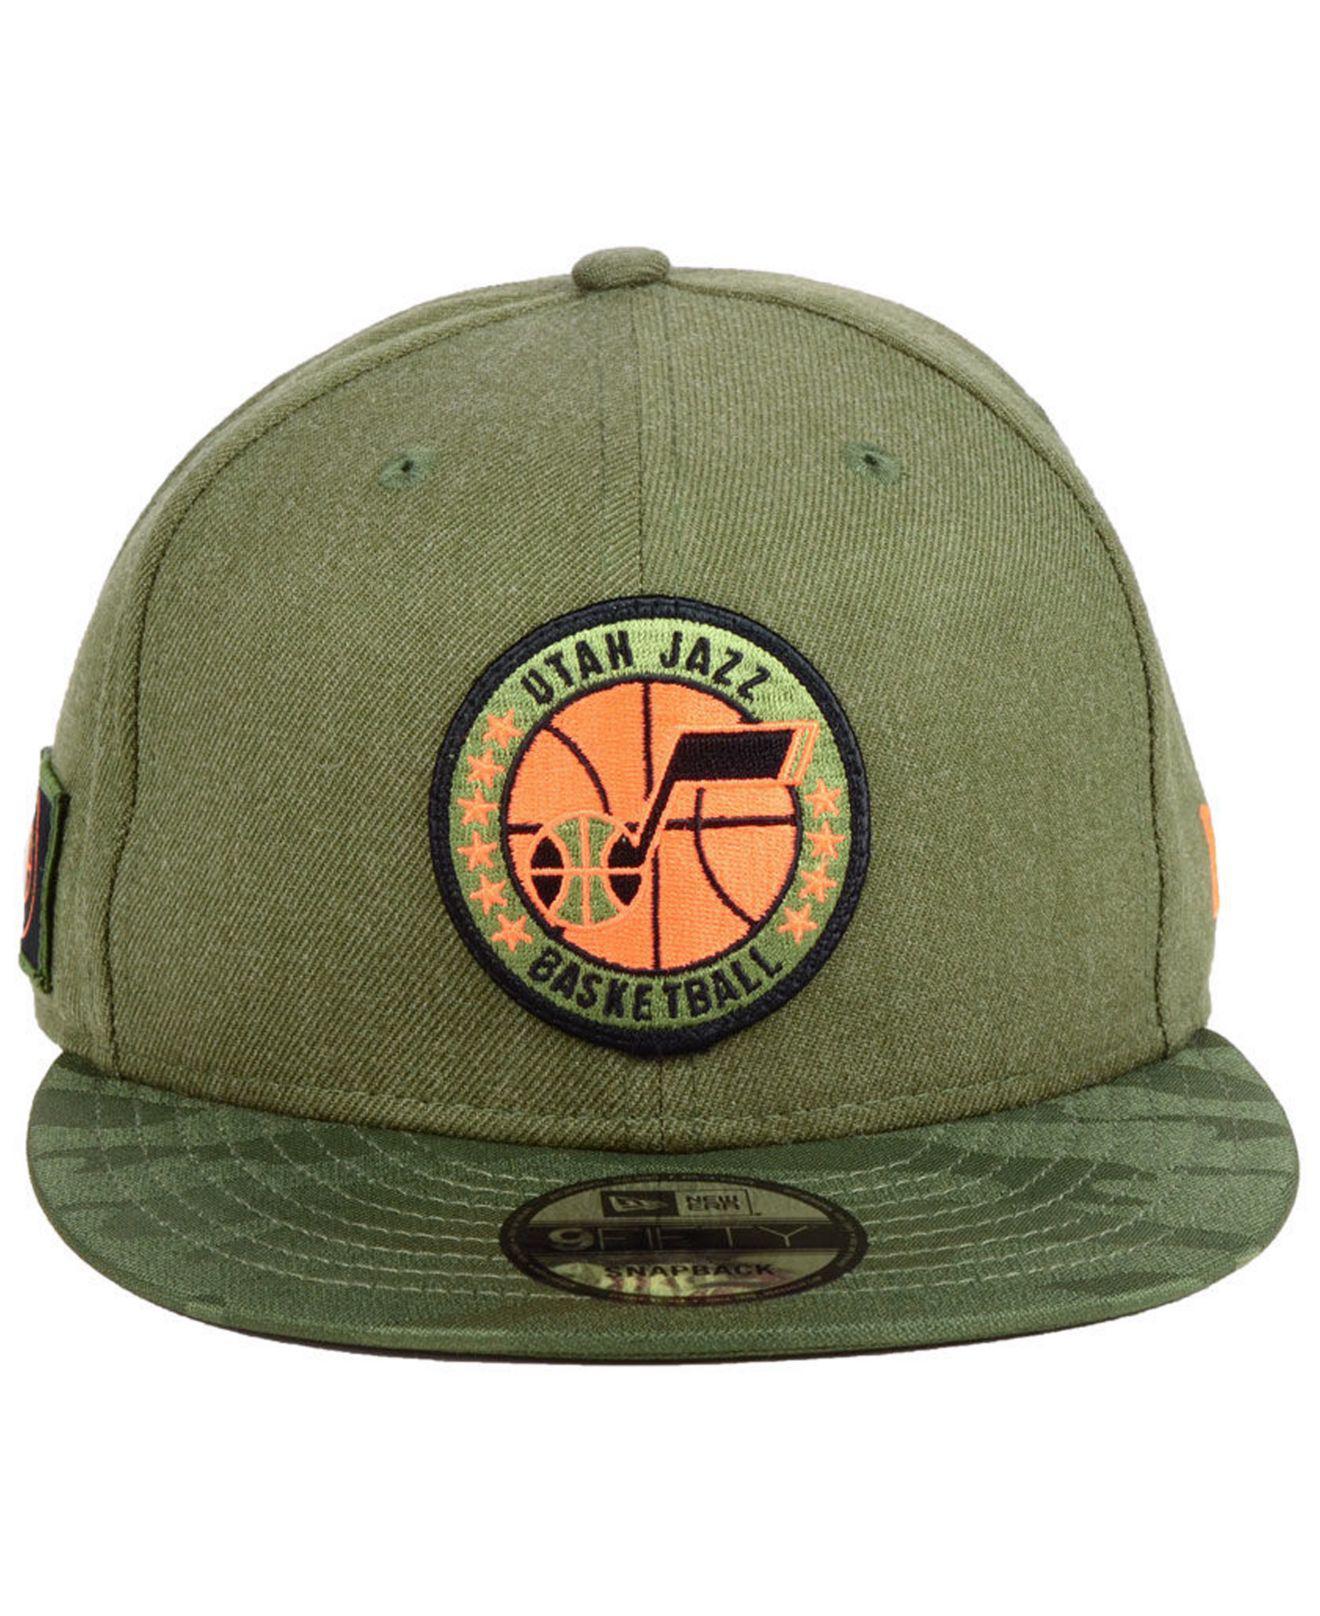 0edb4e4c129 Lyst - KTZ Utah Jazz Tip Off 9fifty Snapback Cap in Green for Men